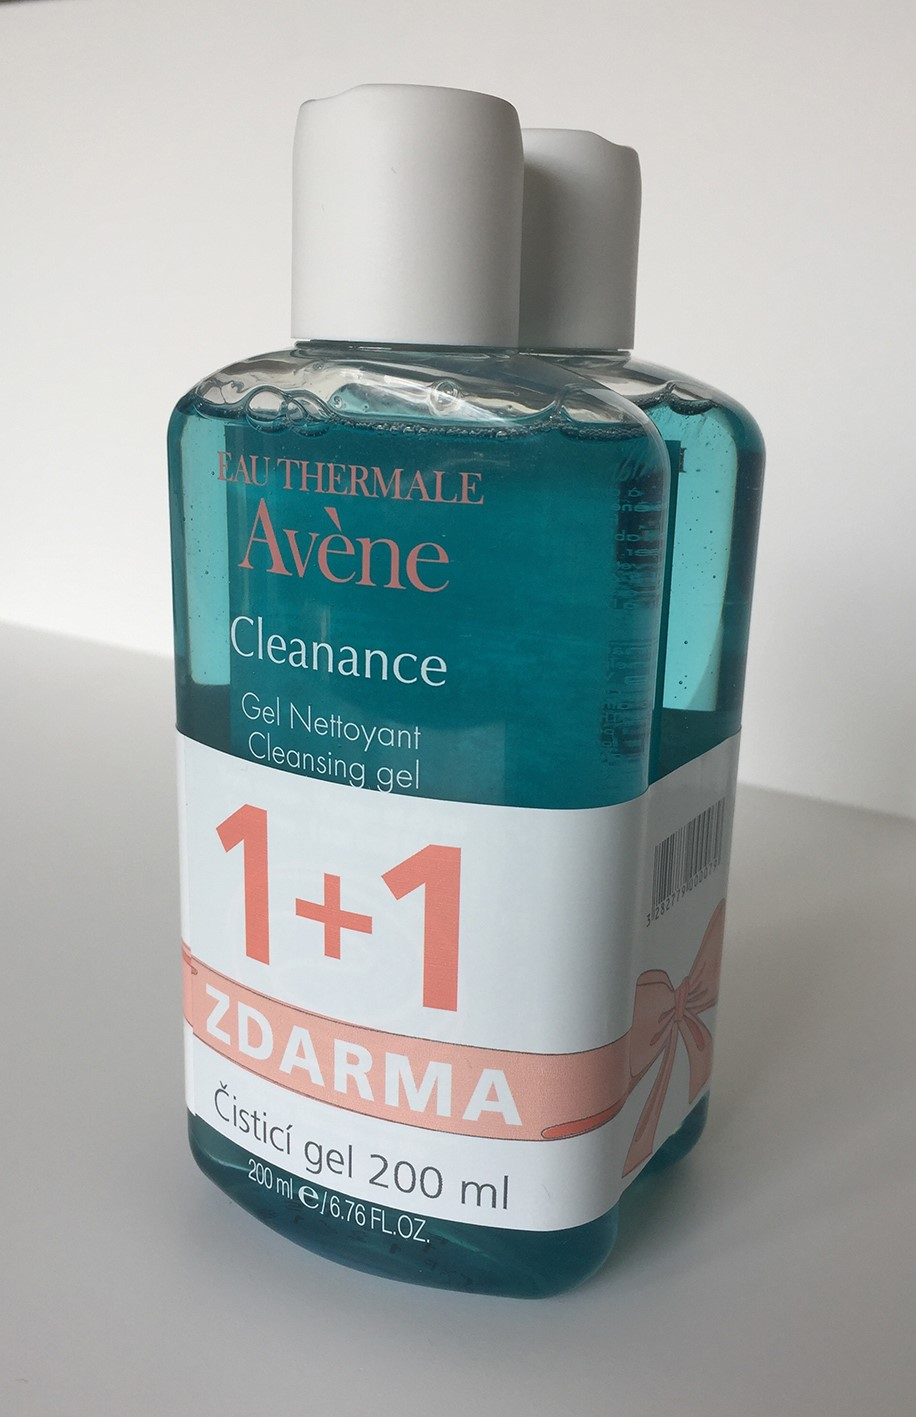 AVENE Promo Cleanance gel 1 plus 1